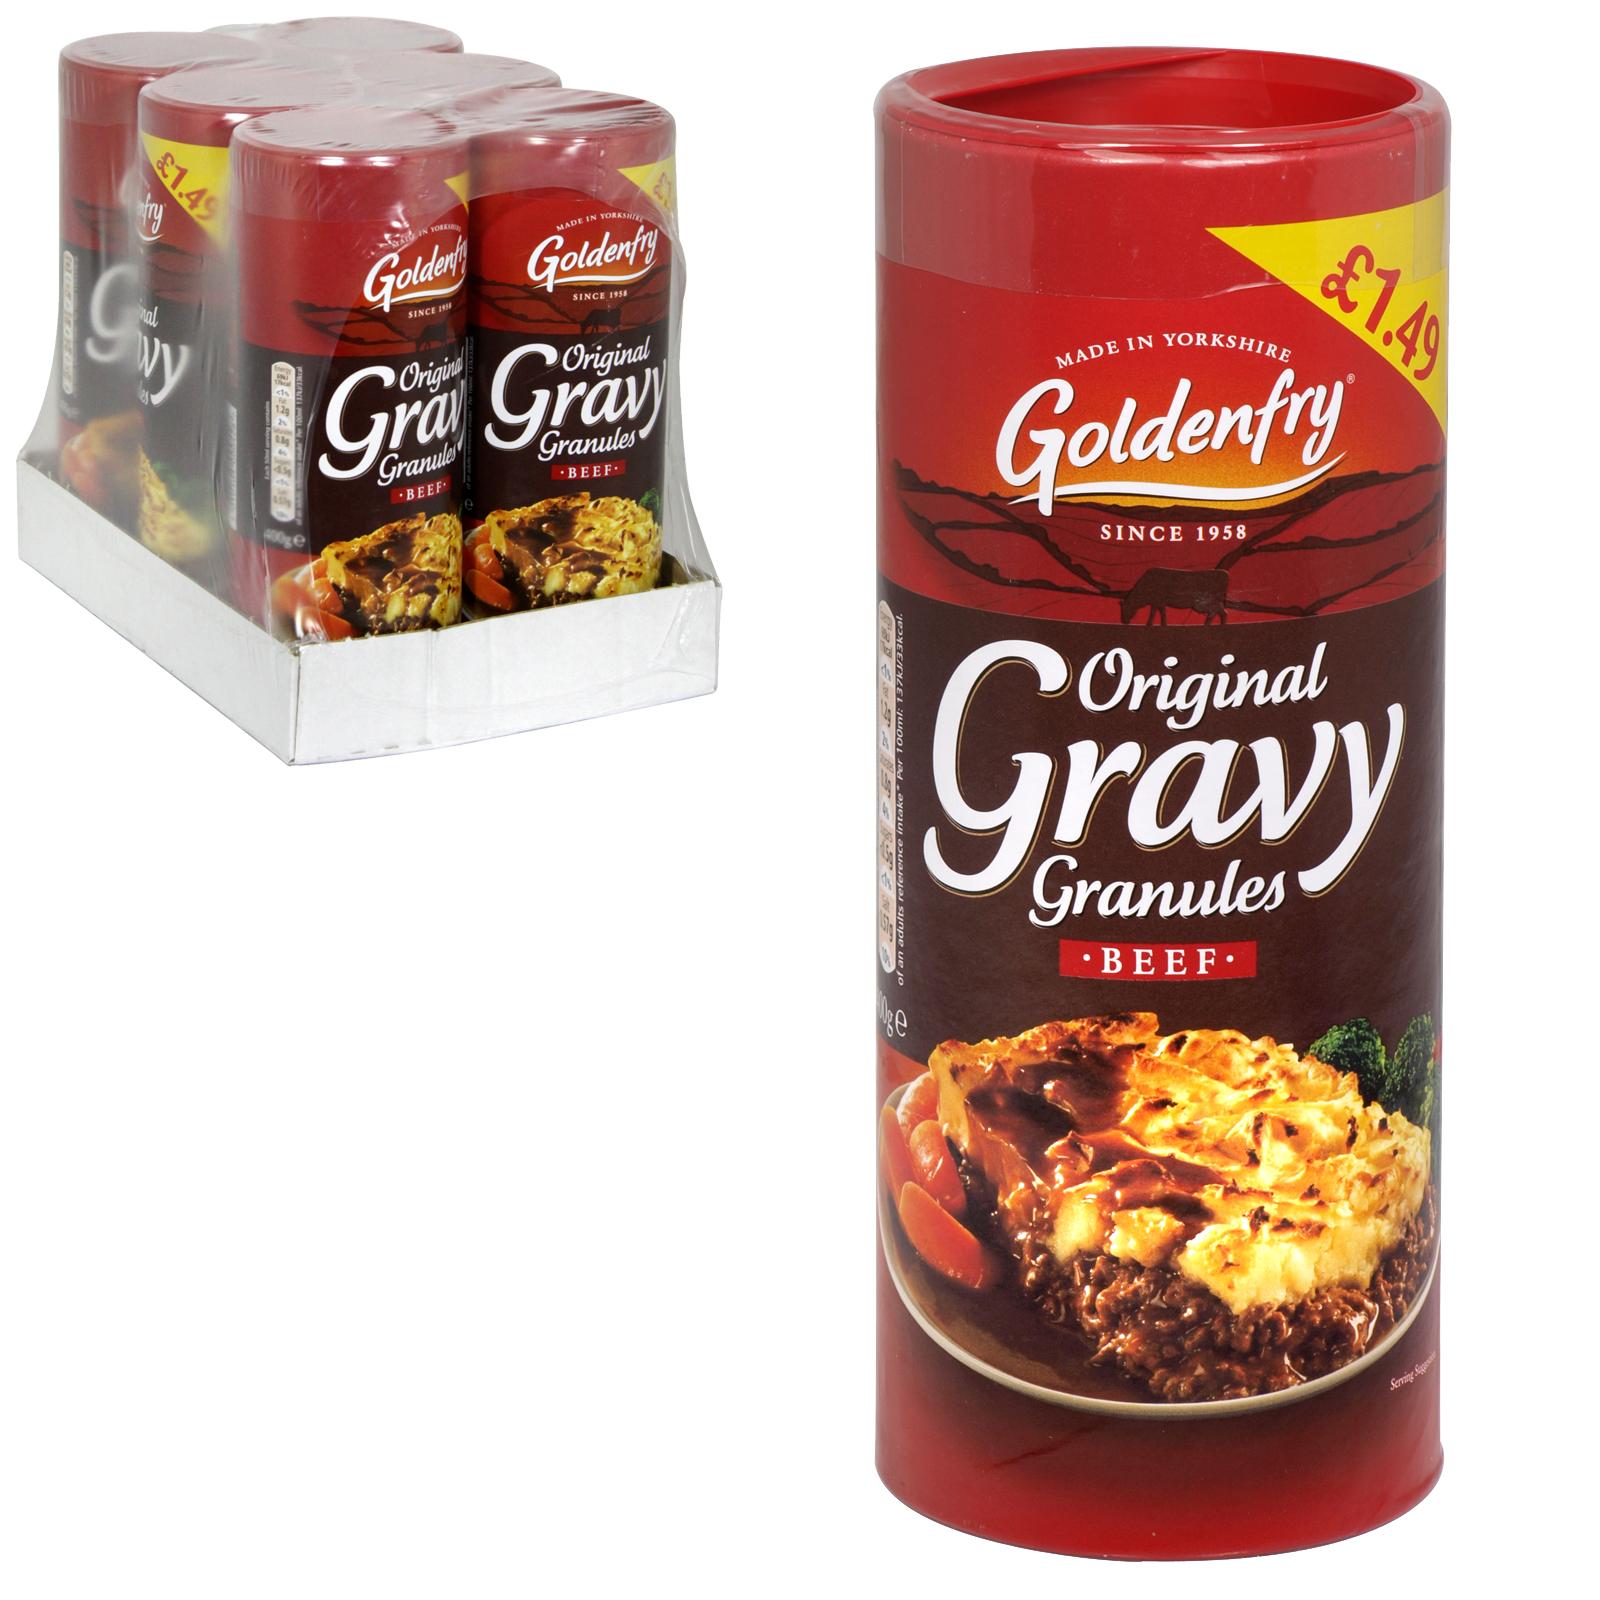 GOLDEN FRY BEEF GRAVY GRANULES 300G X6